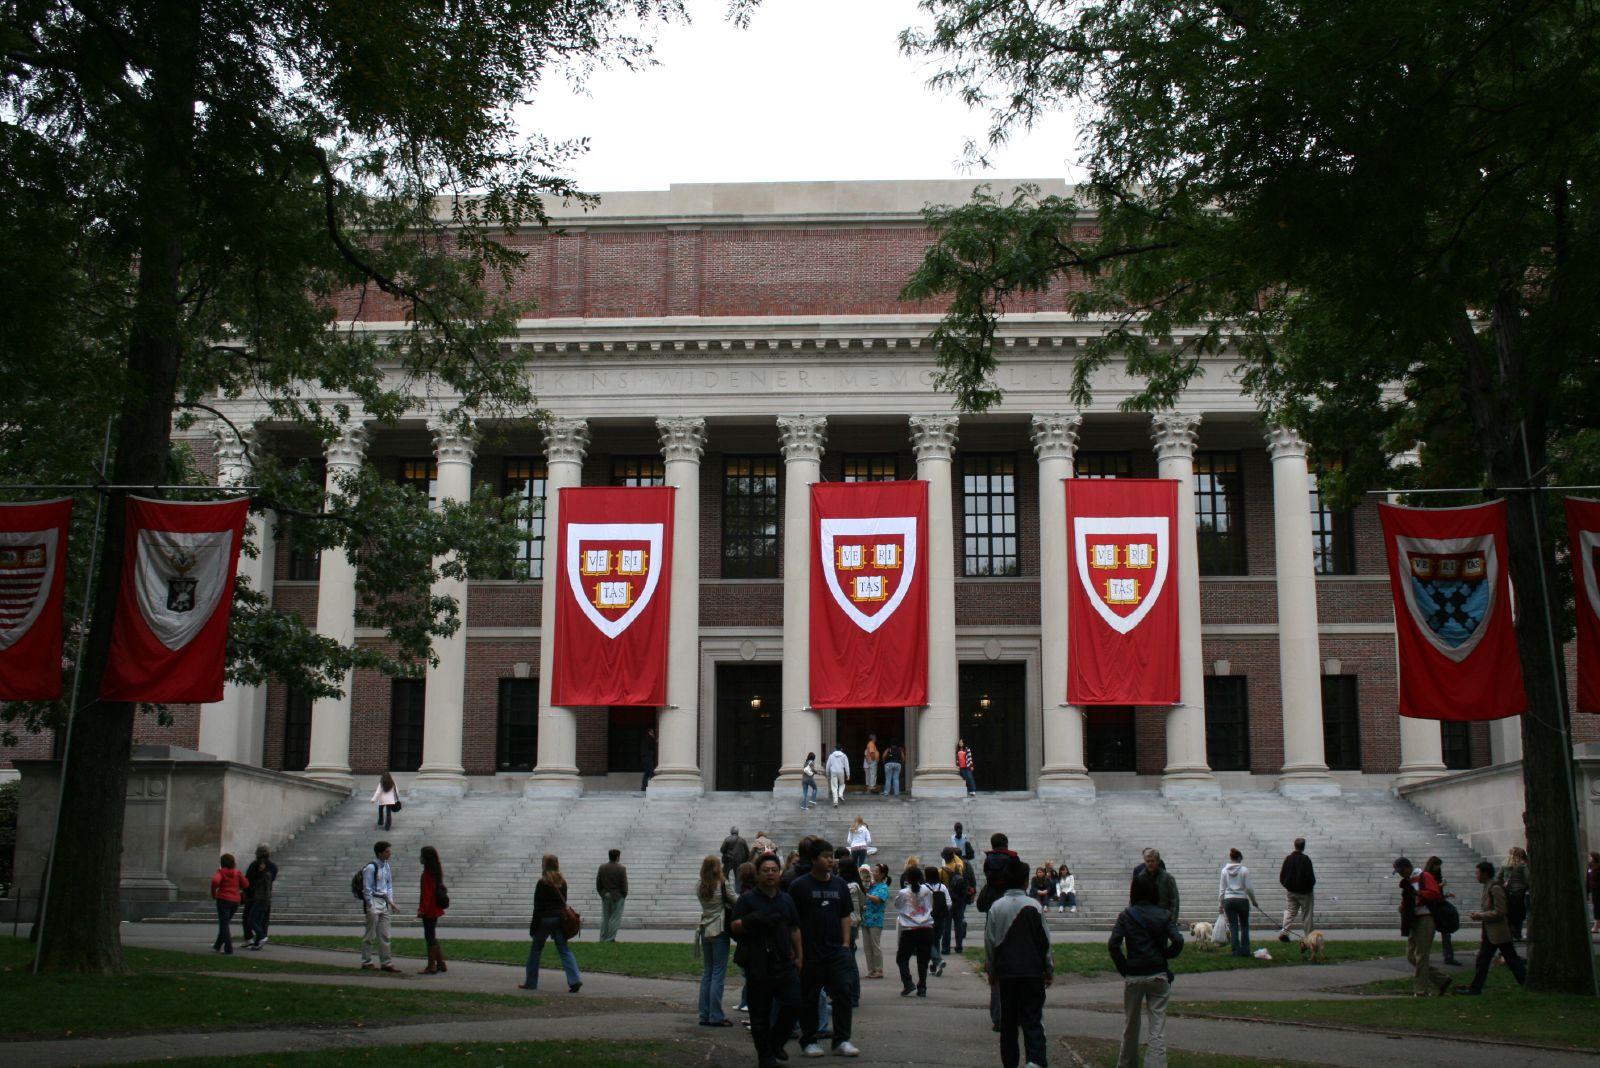 FileHarvard University Widener Library